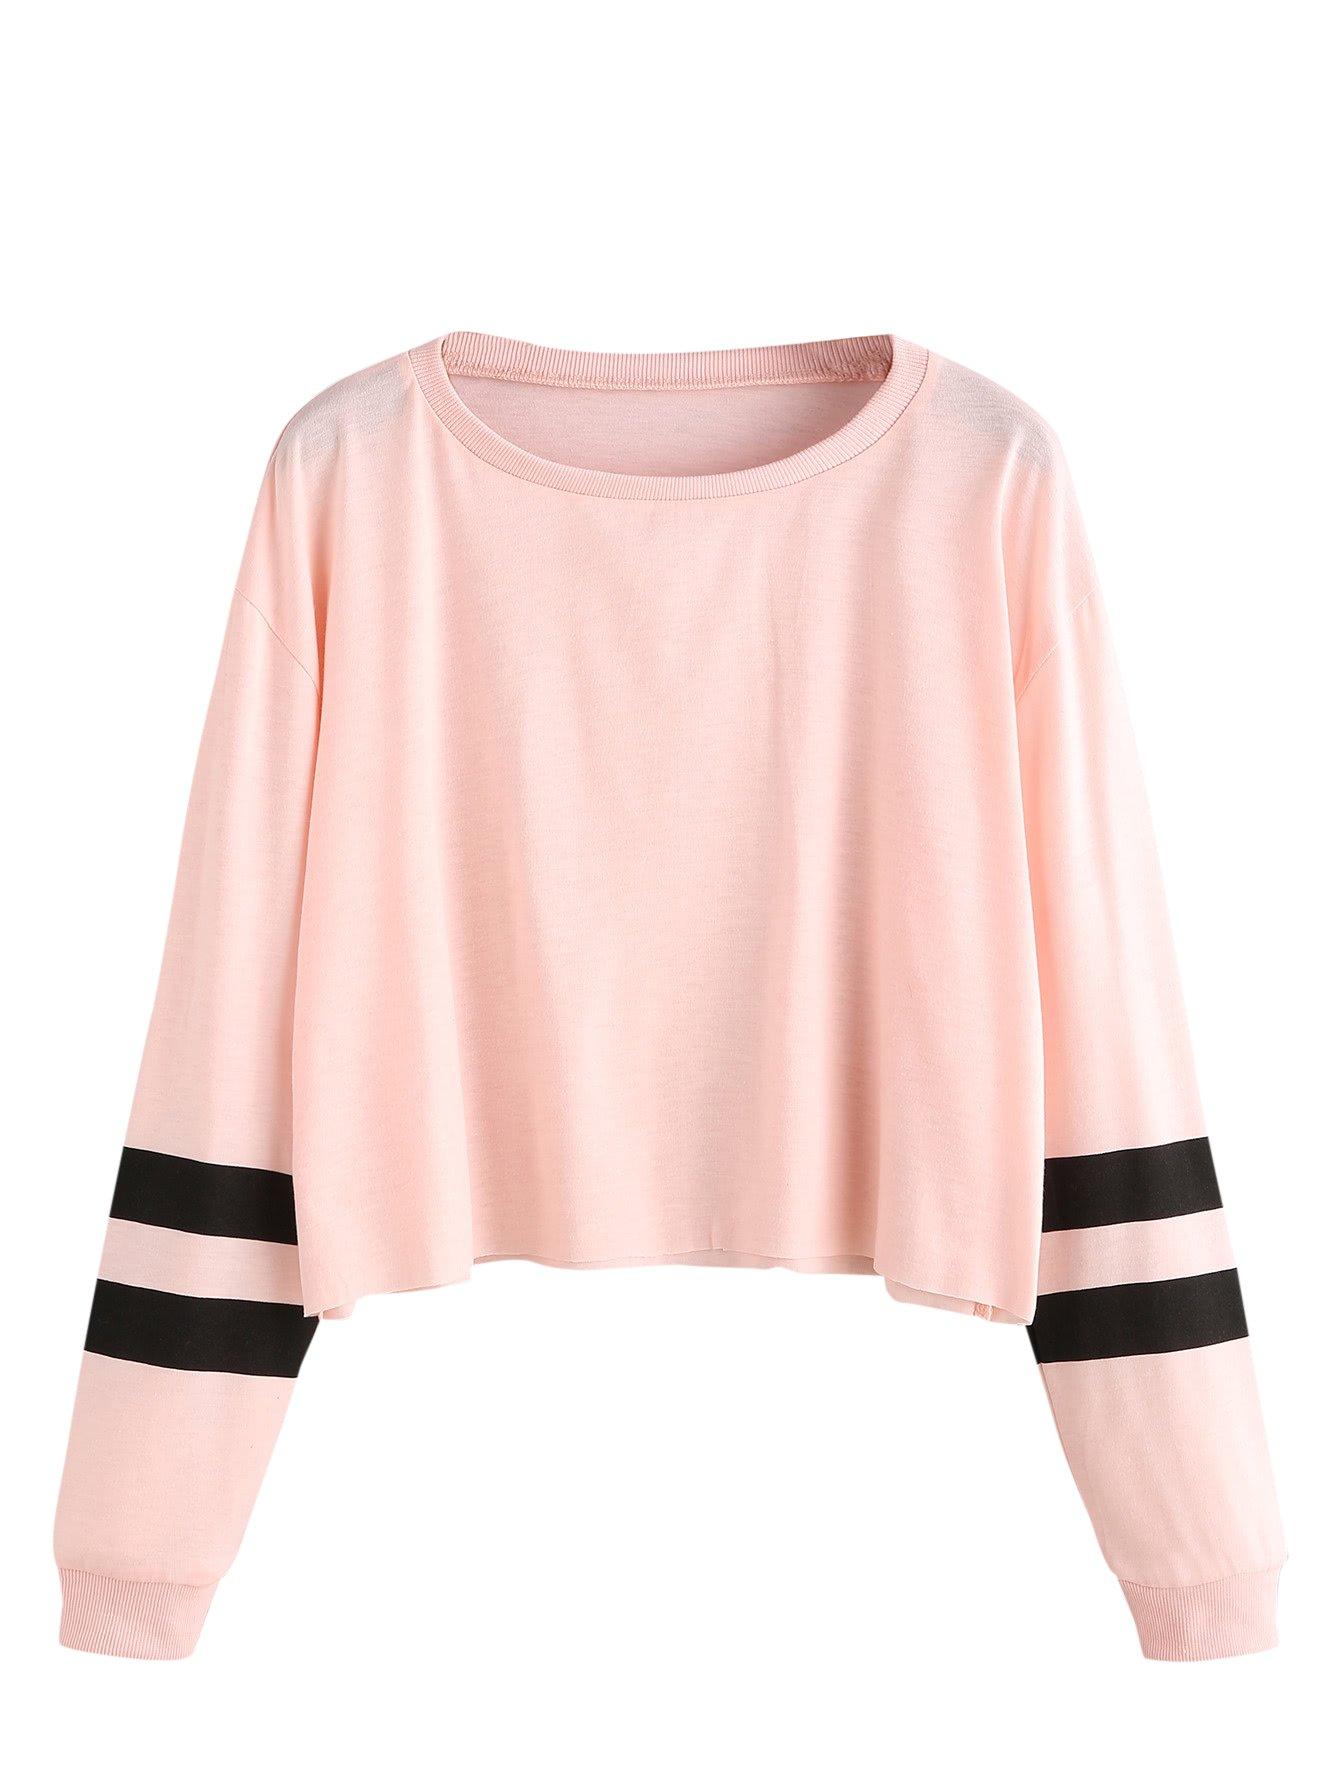 SweatyRocks Women's Striped Long Sleeve Crewneck Crop Top Sweatshirt Pink L